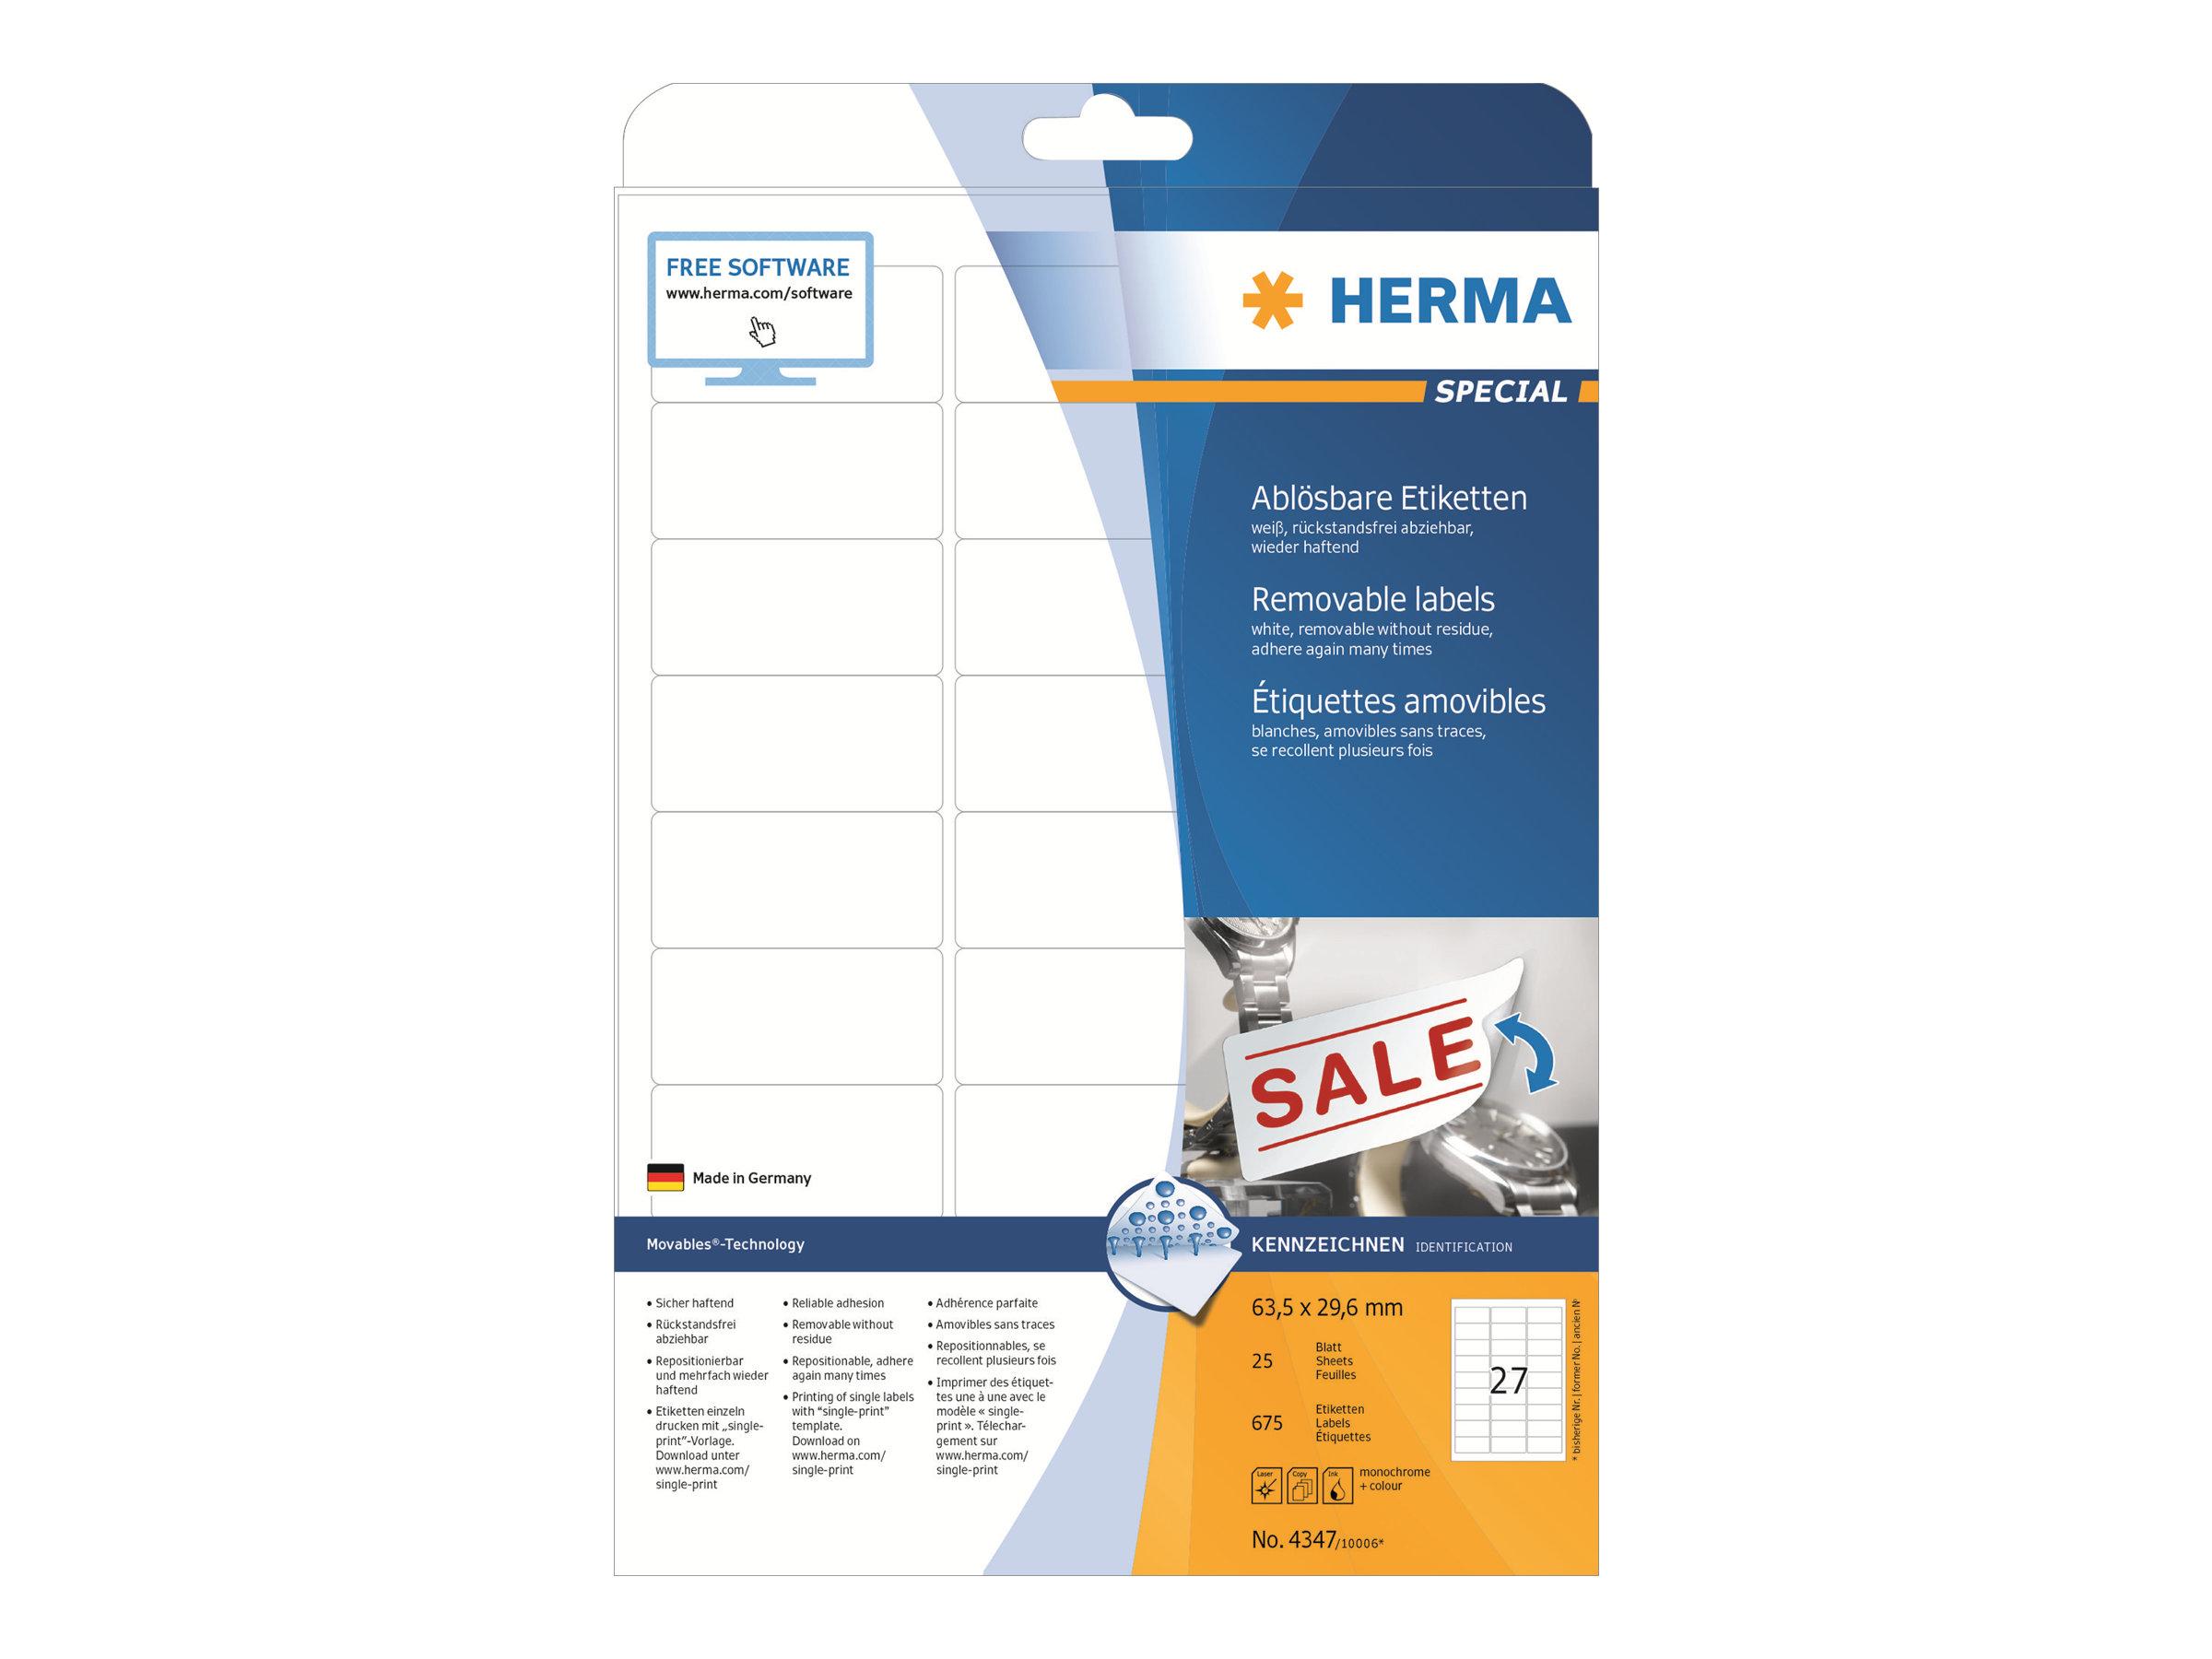 HERMA Special - Papier - matt - selbstklebend, entfernbarer Klebstoff - weiß - 63.5 x 29.6 mm 675 Etikett(en) (25 Bogen x 27)